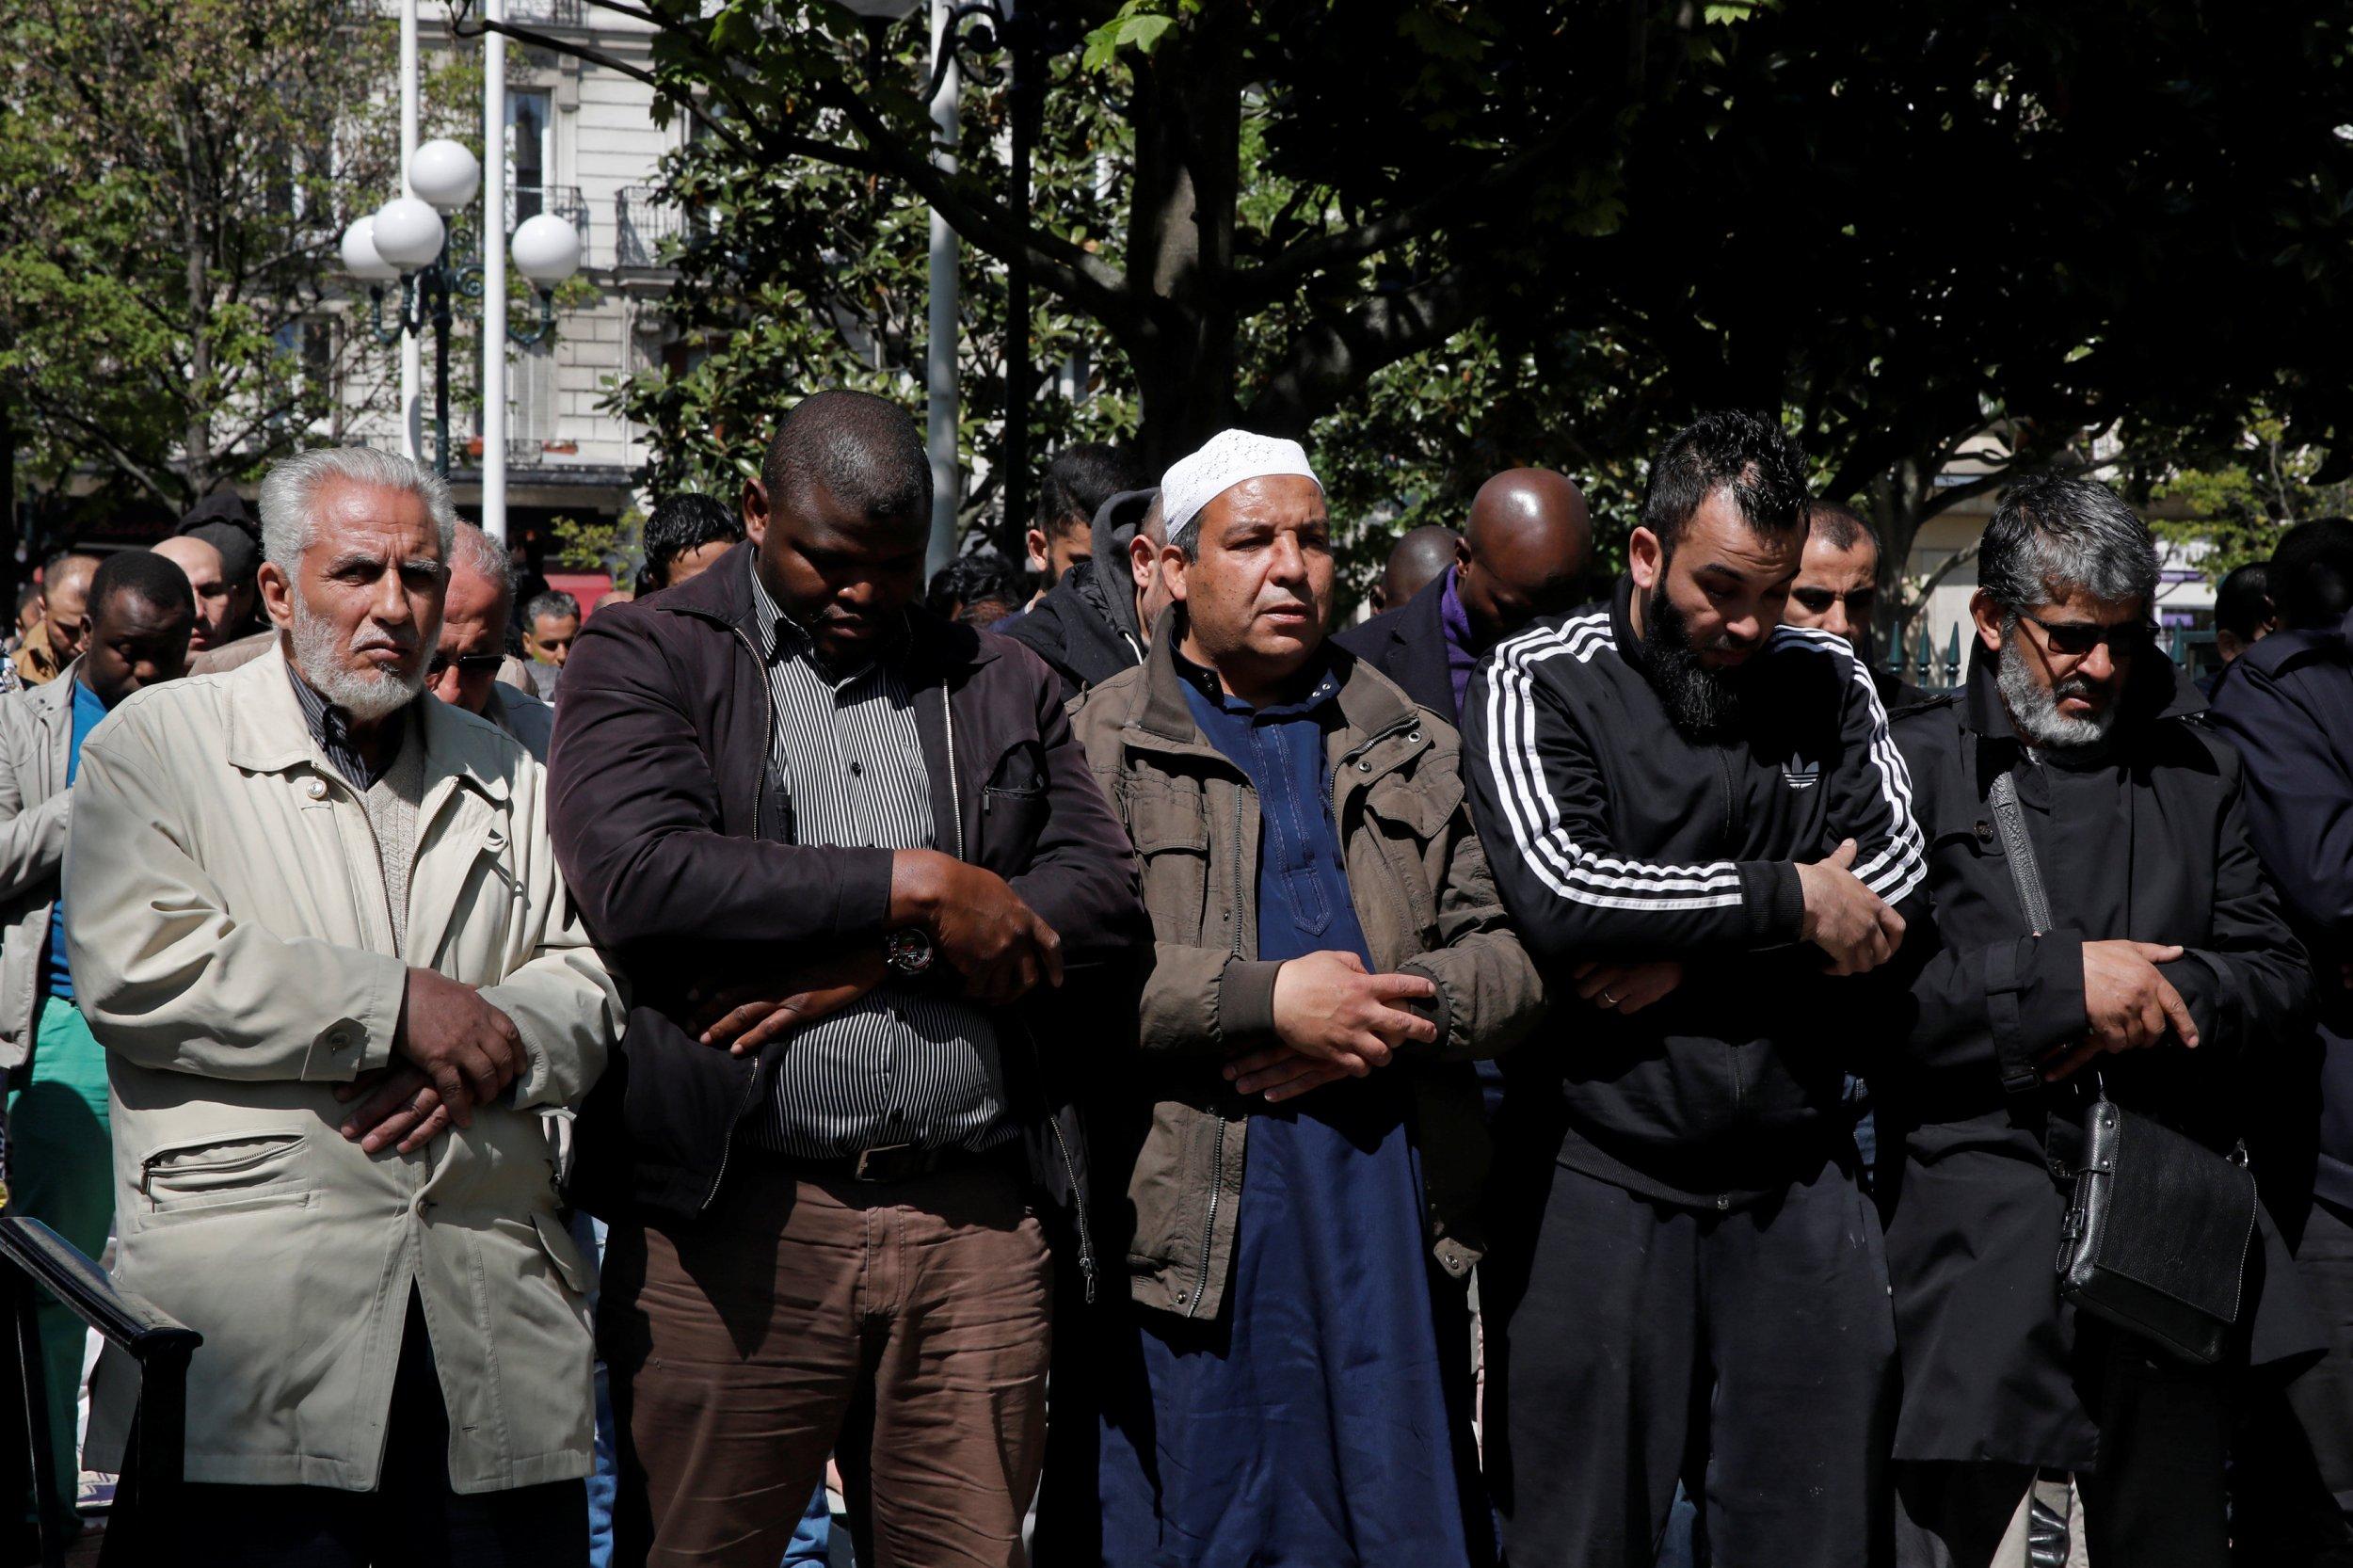 muslim_discrimination_europe_0426